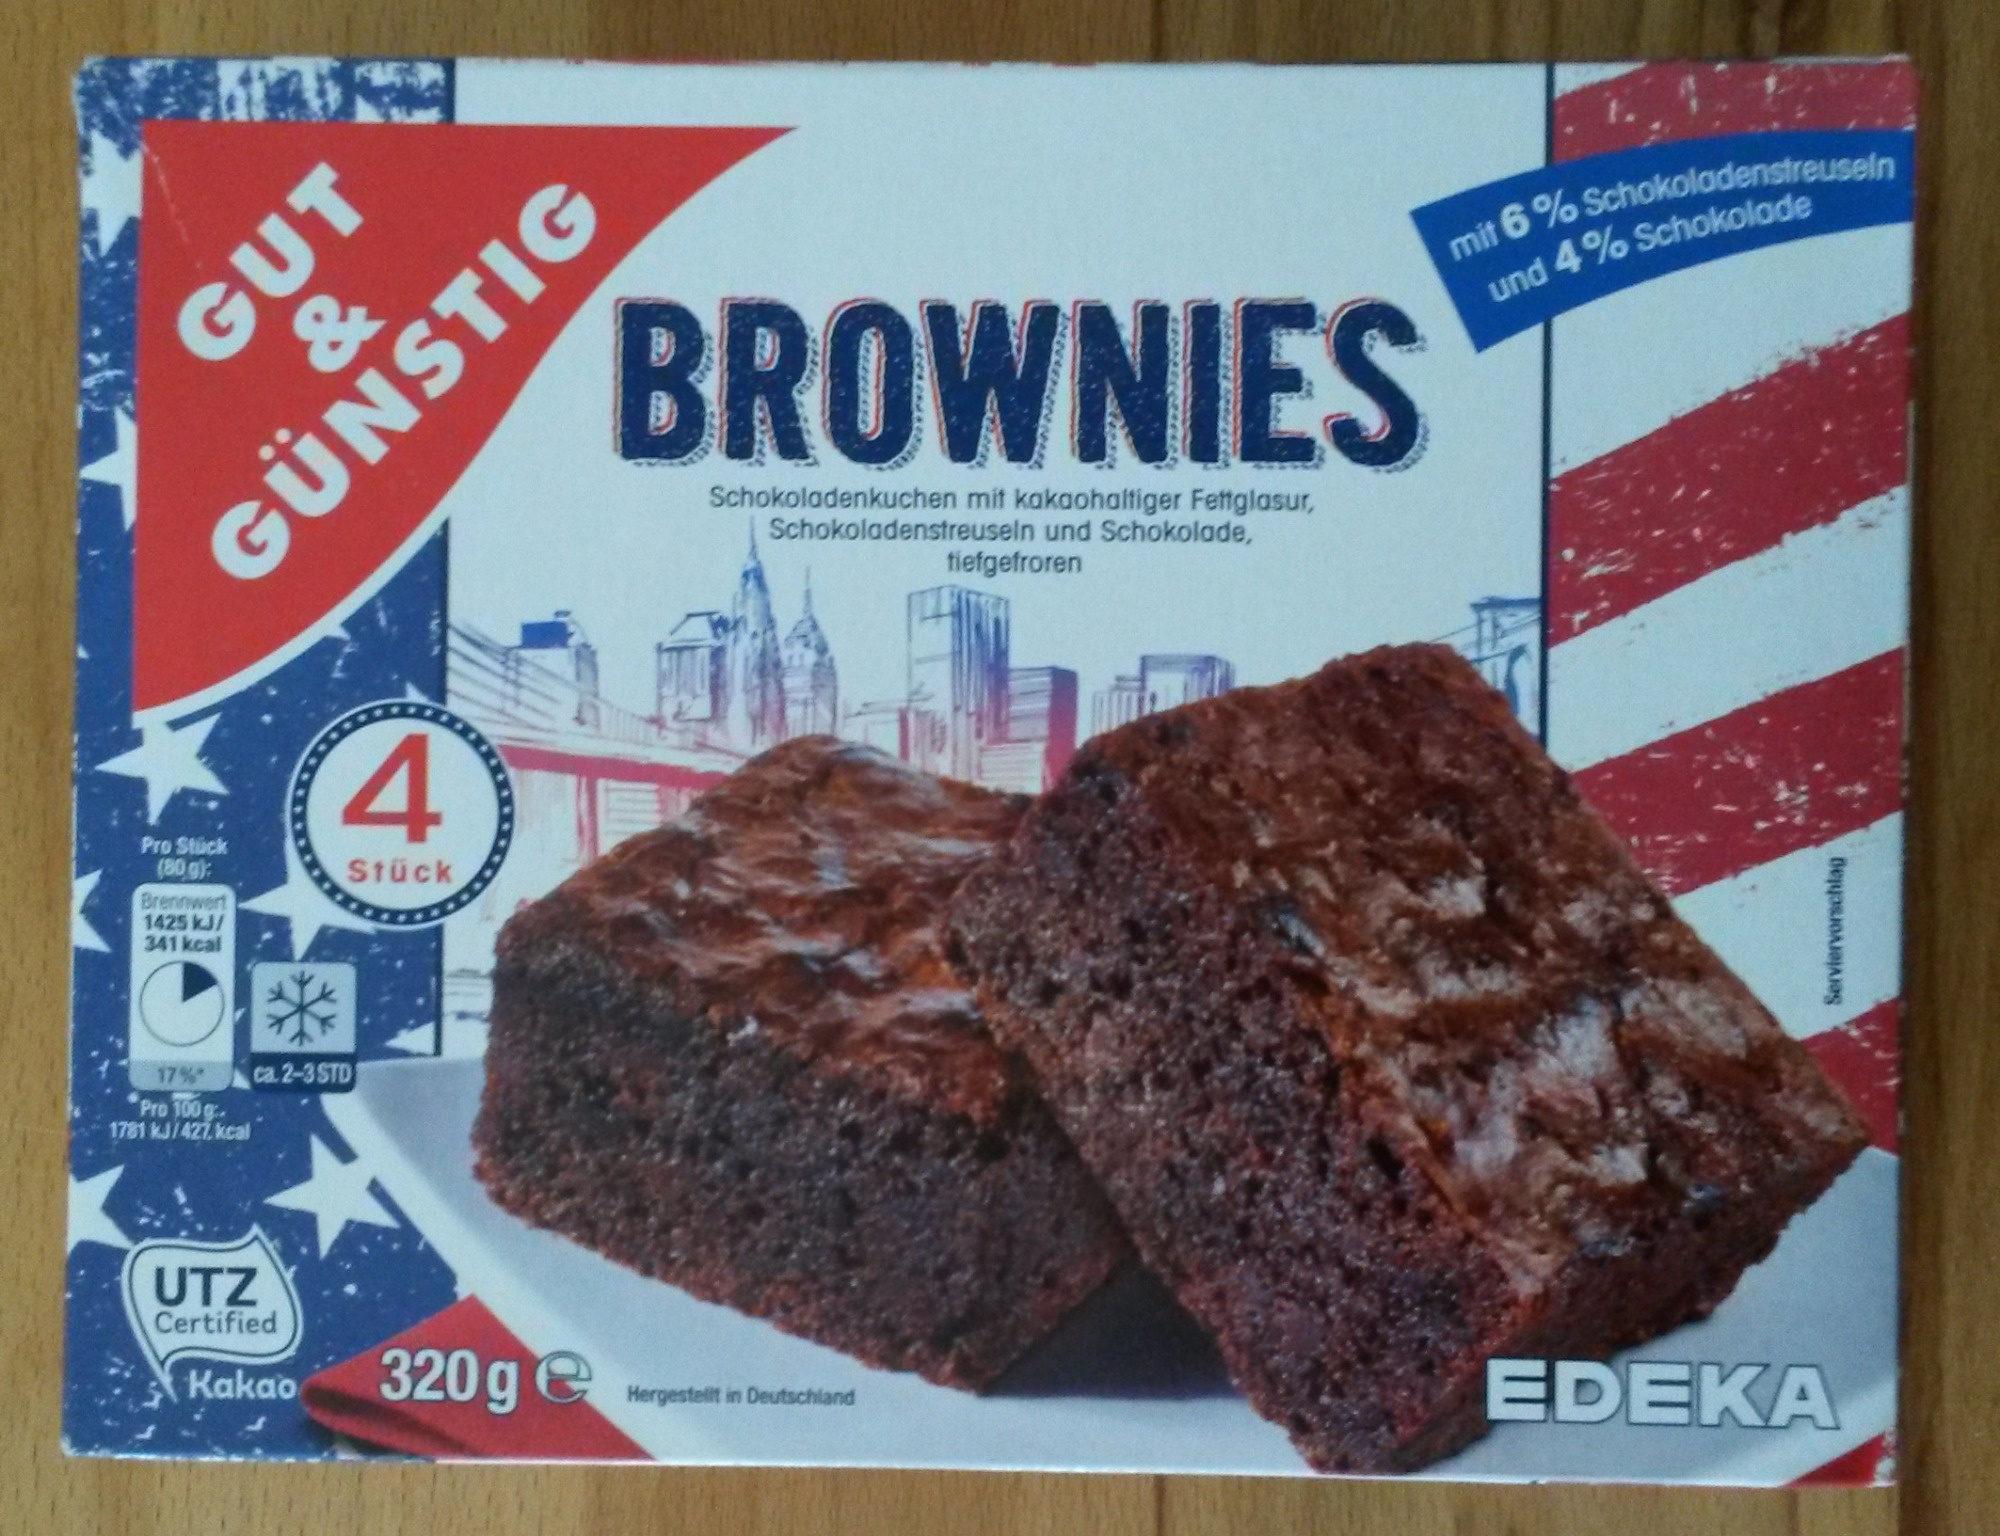 Brownies Gut Gunstig 320g